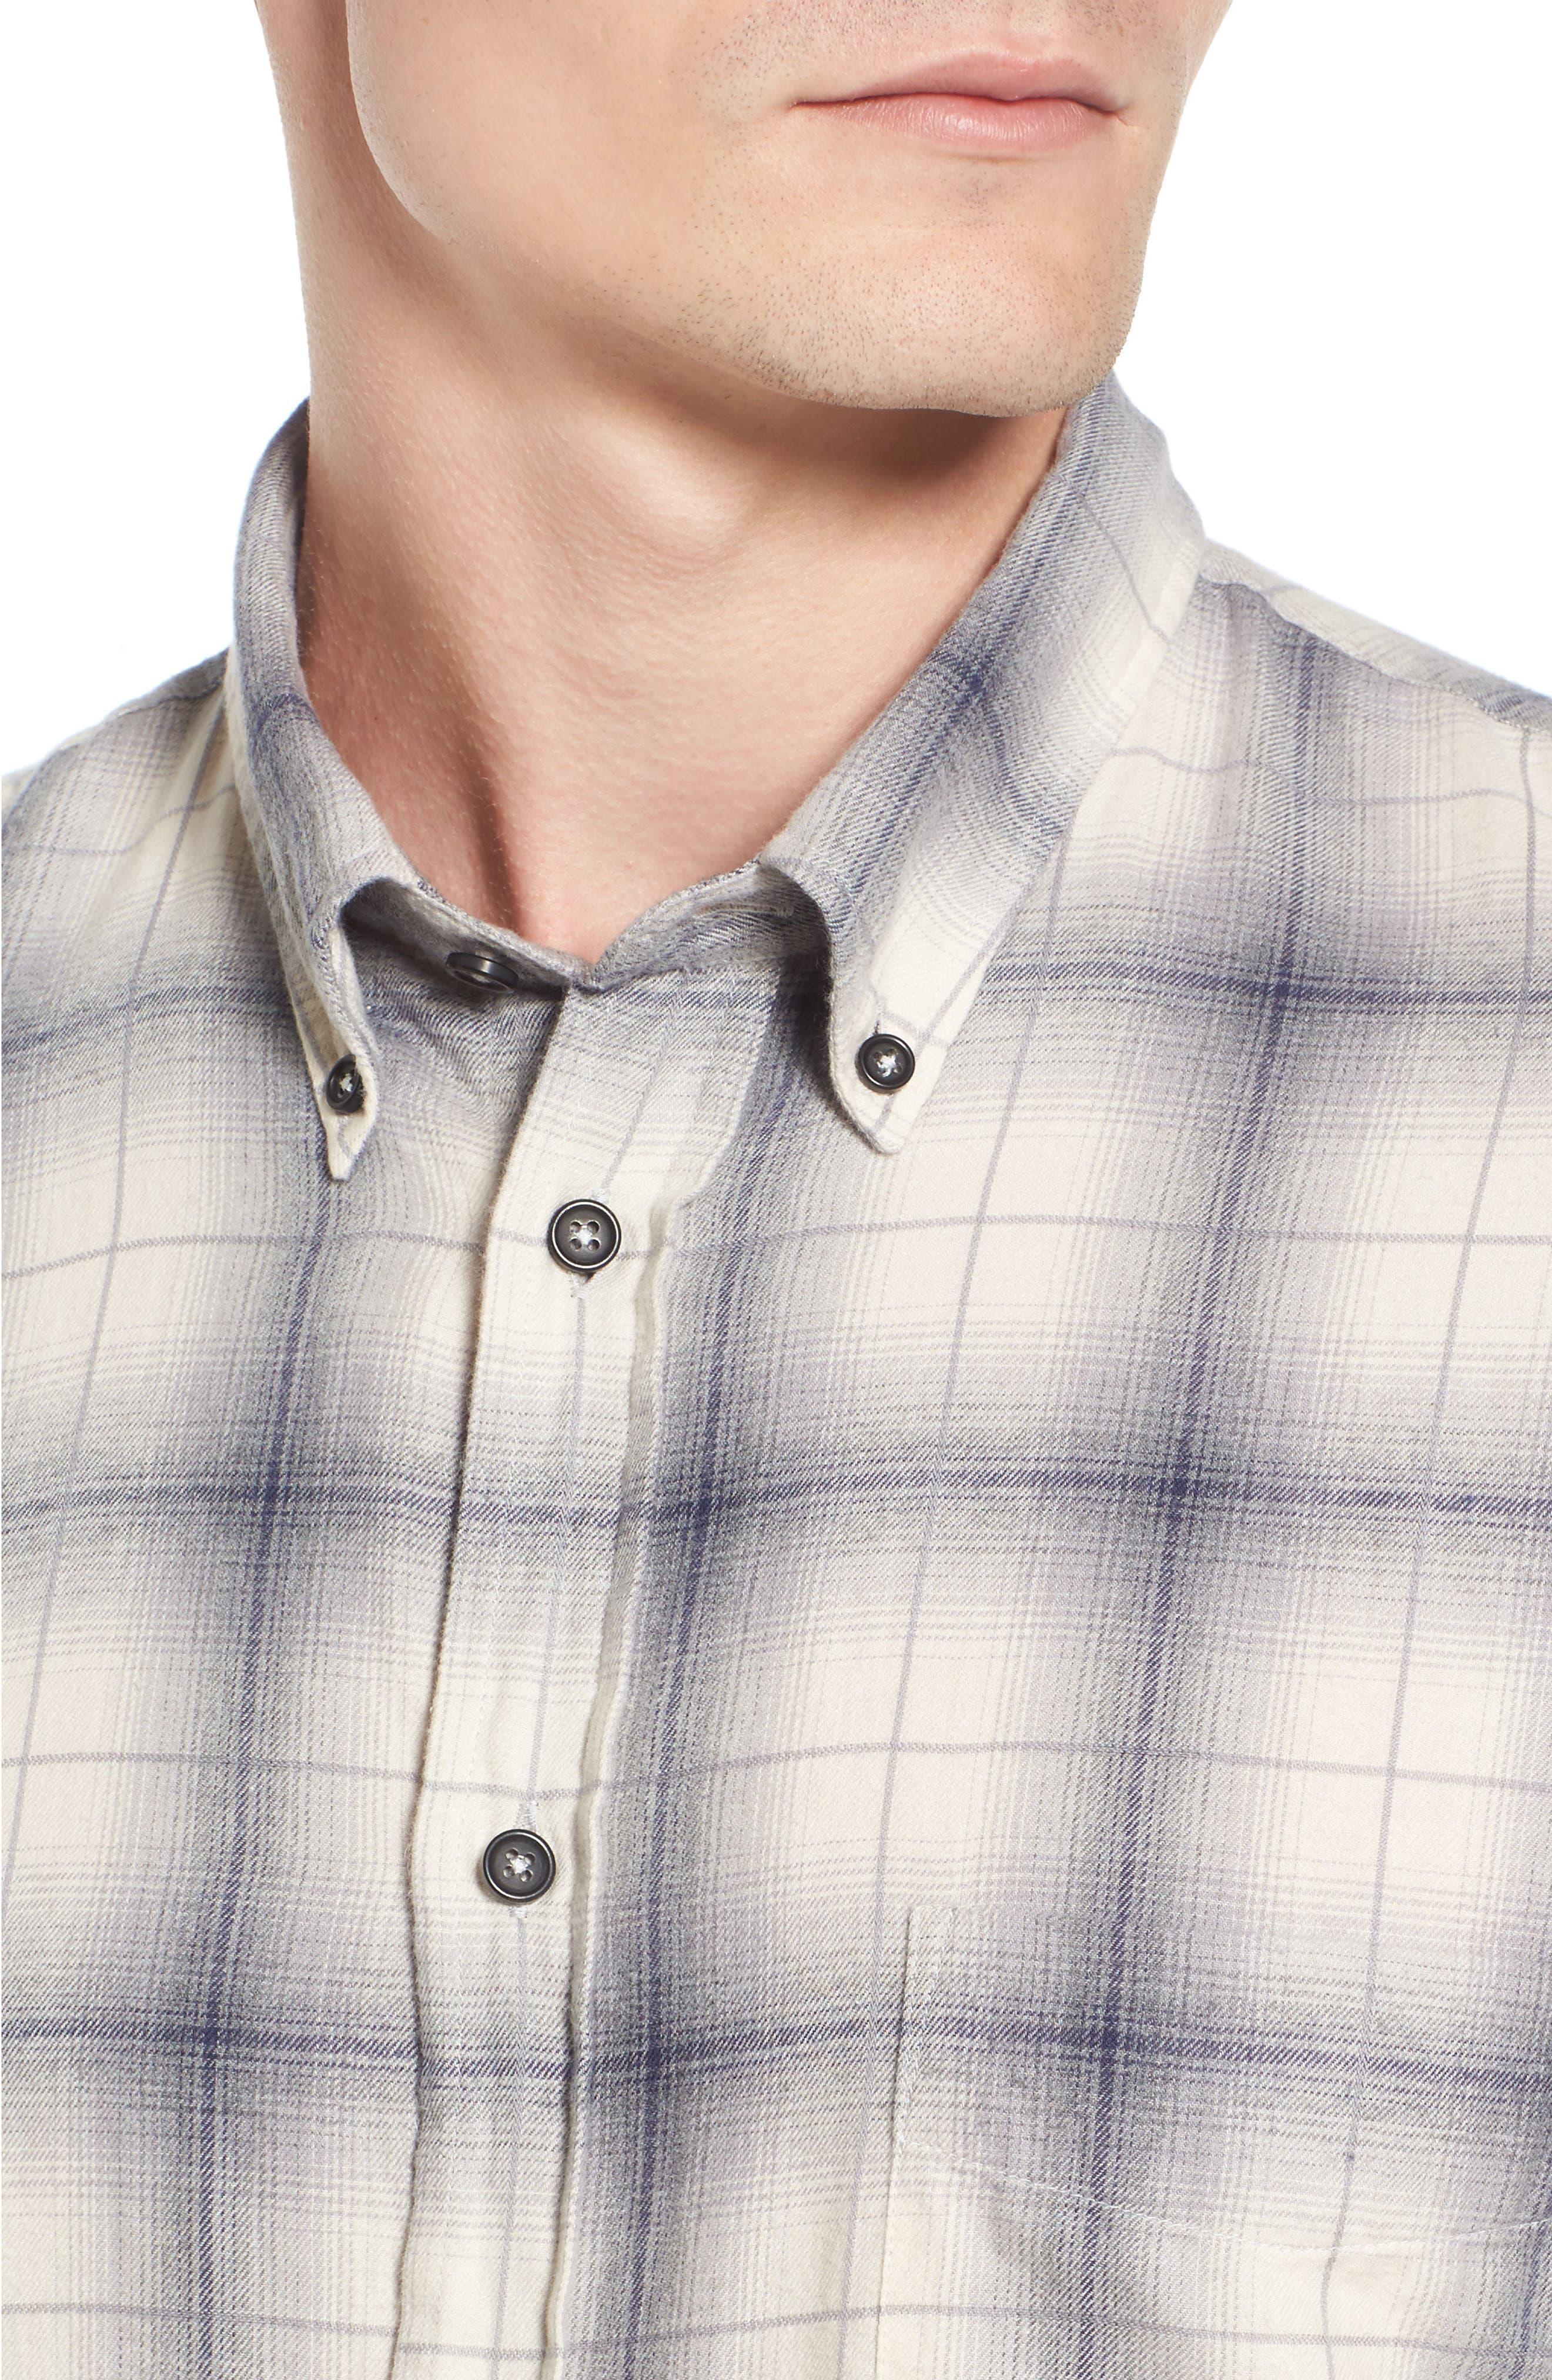 Kirby Slim Fit Plaid Flannel Shirt,                             Alternate thumbnail 4, color,                             Grey/ Blue